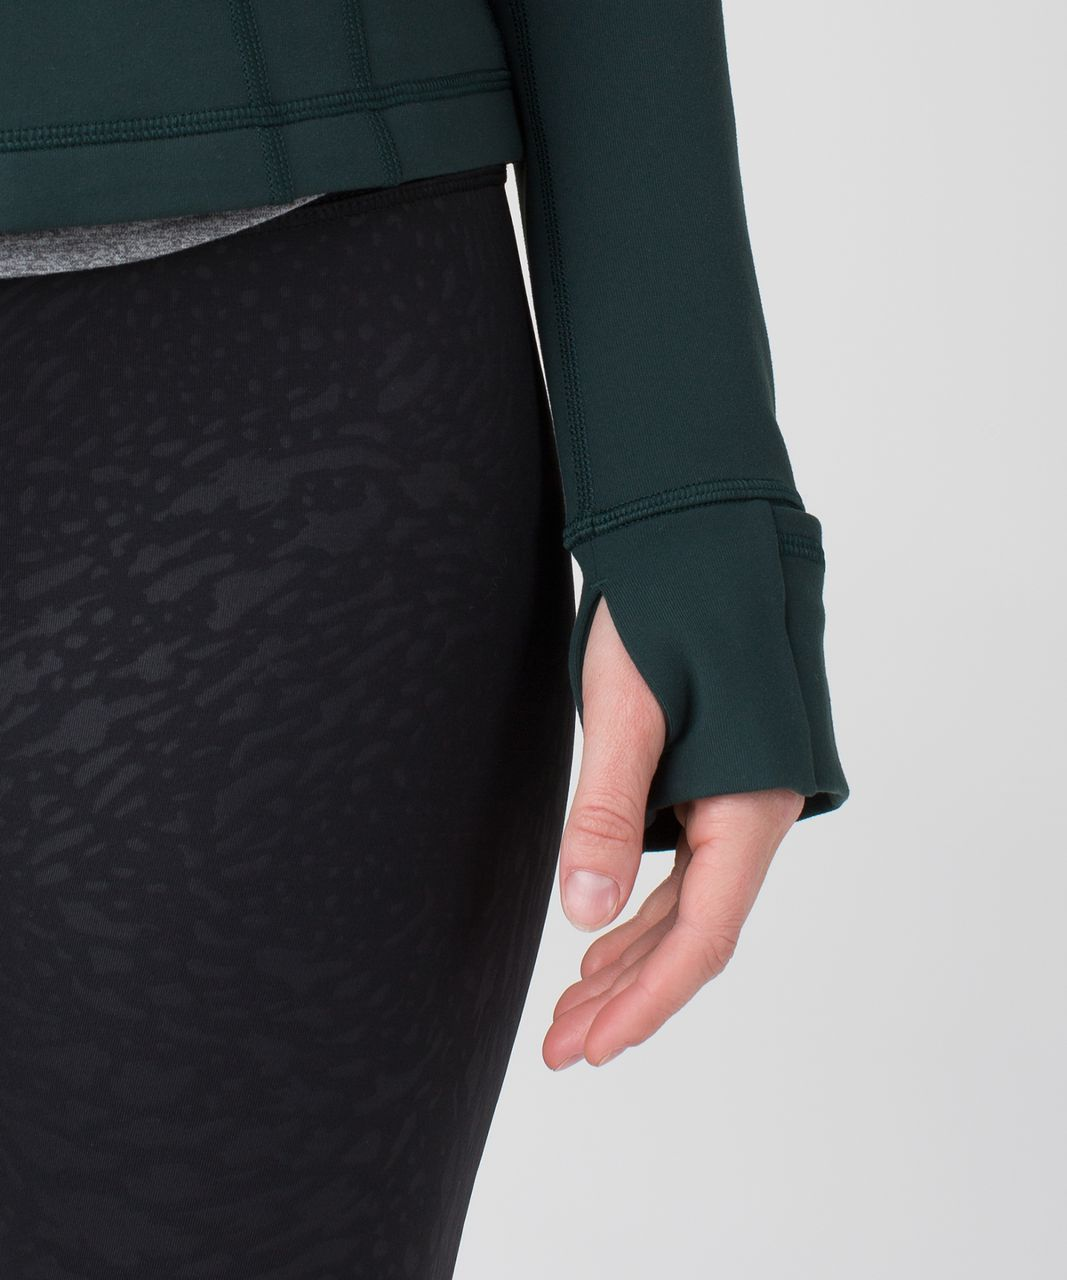 Lululemon Define Jacket - Fuel Green